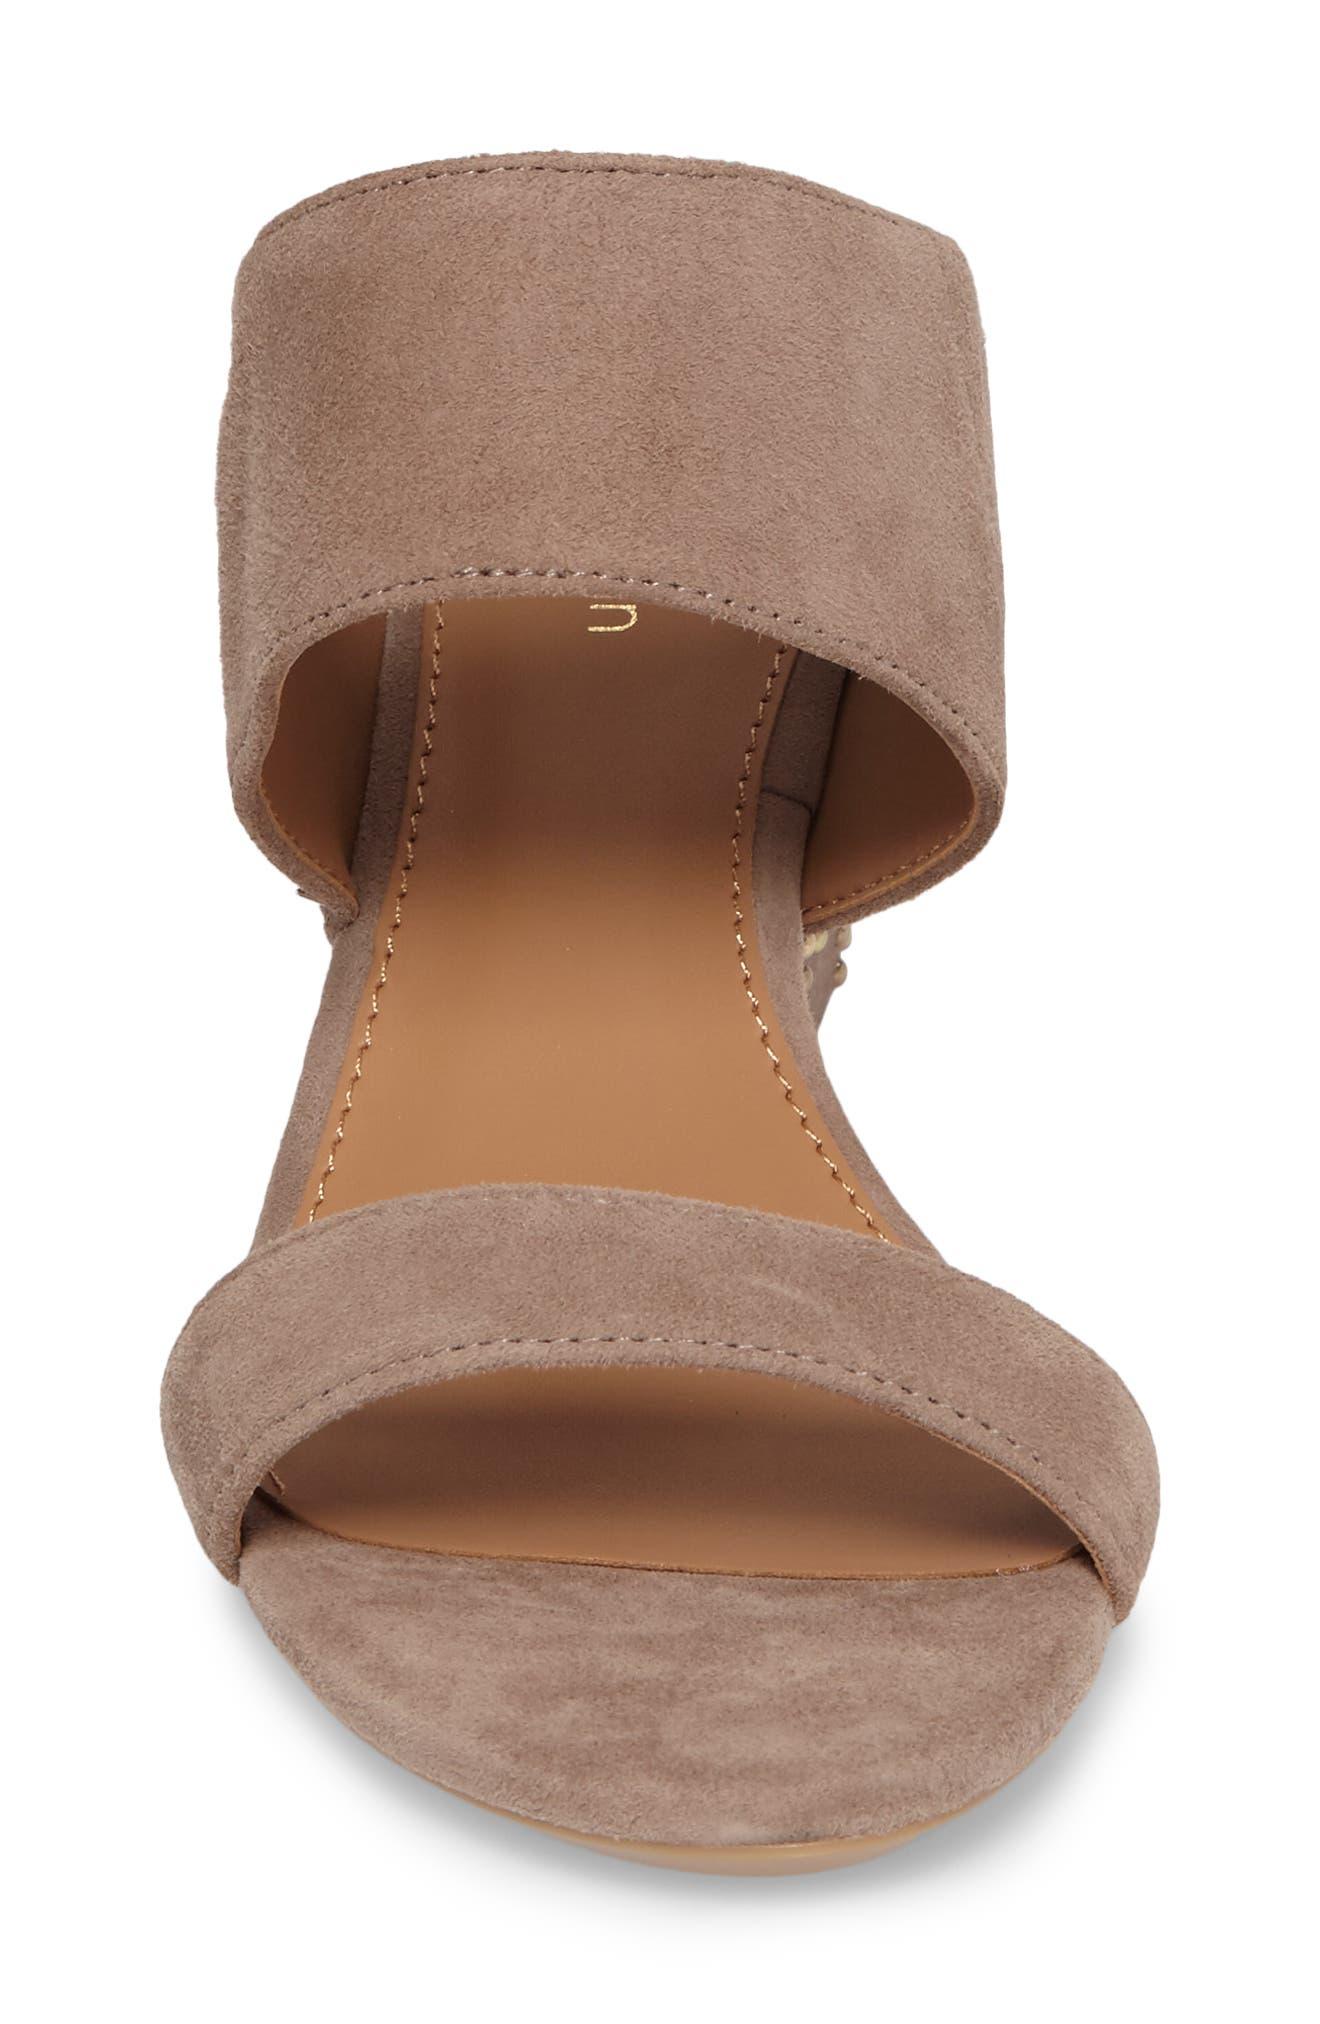 Phyllis Studded Wedge Sandal,                             Alternate thumbnail 14, color,